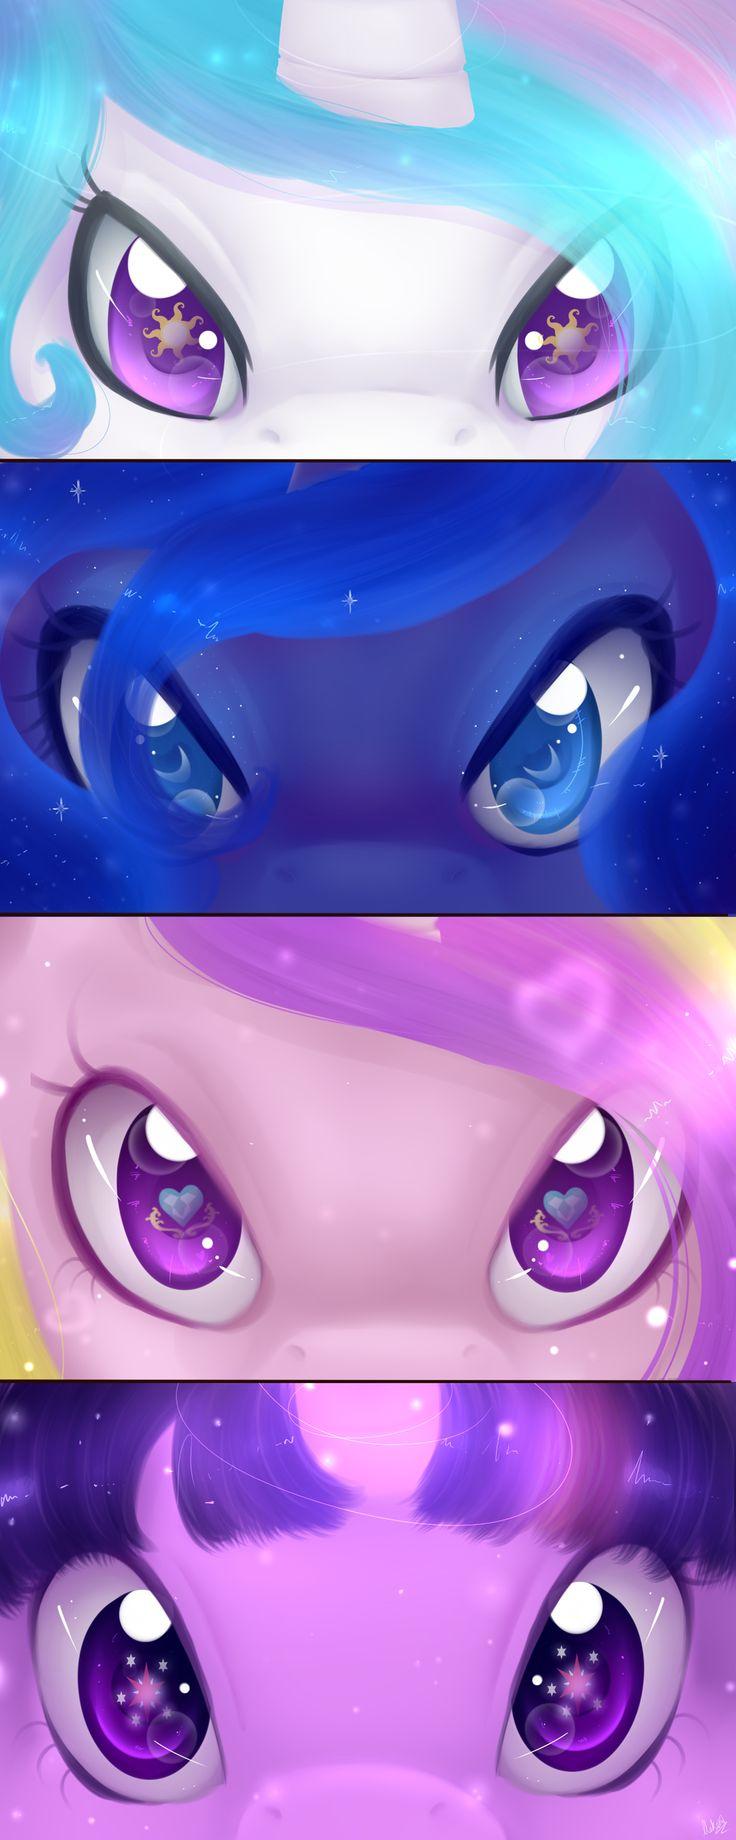 Princess Eyes by Neko-luvz on DeviantArt